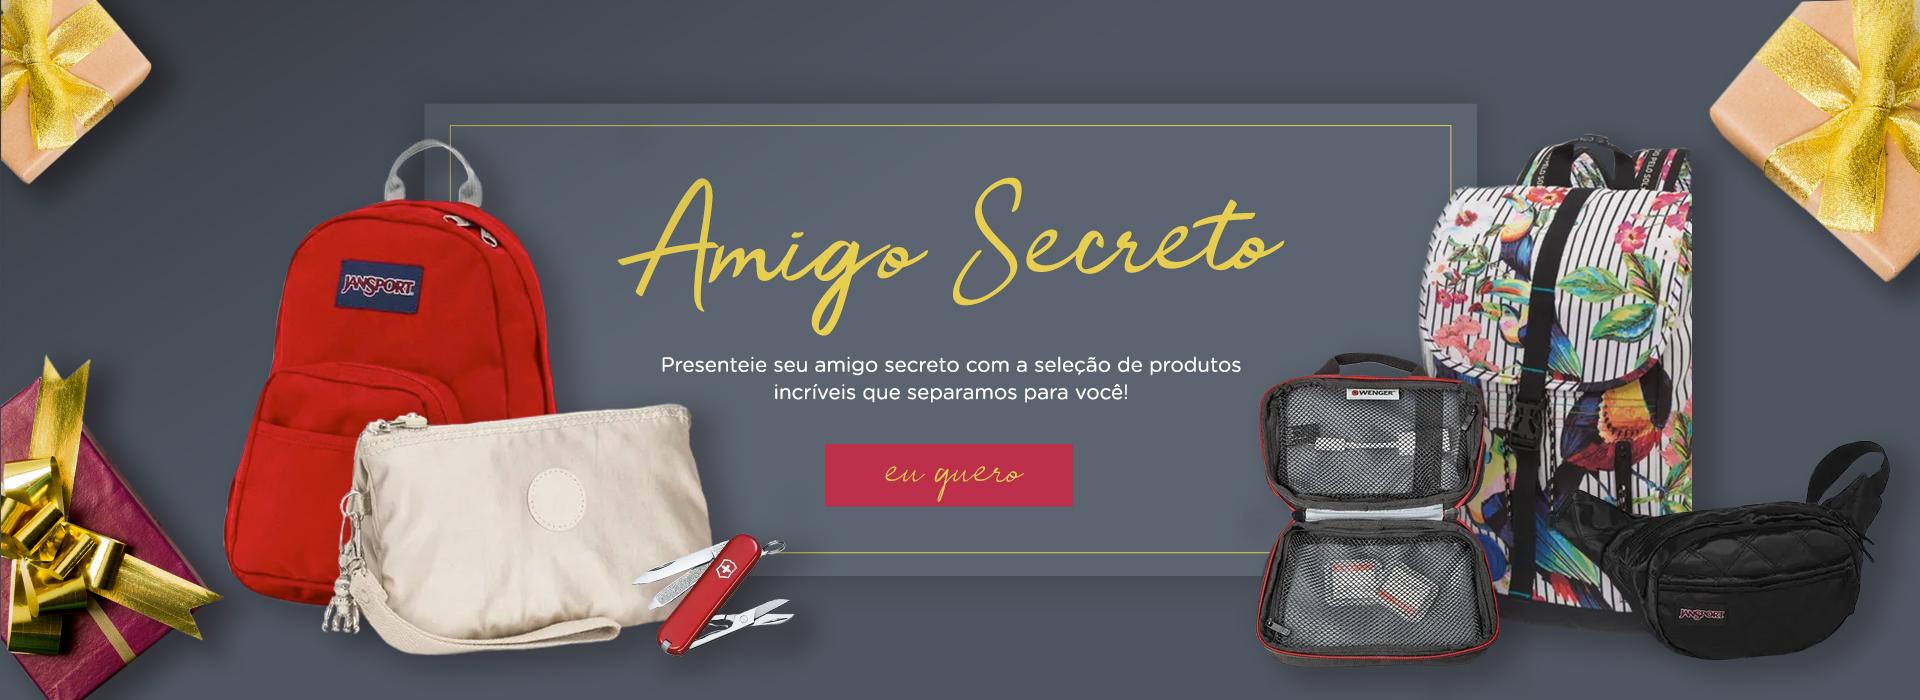 Banner 1 - Amigo Secreto